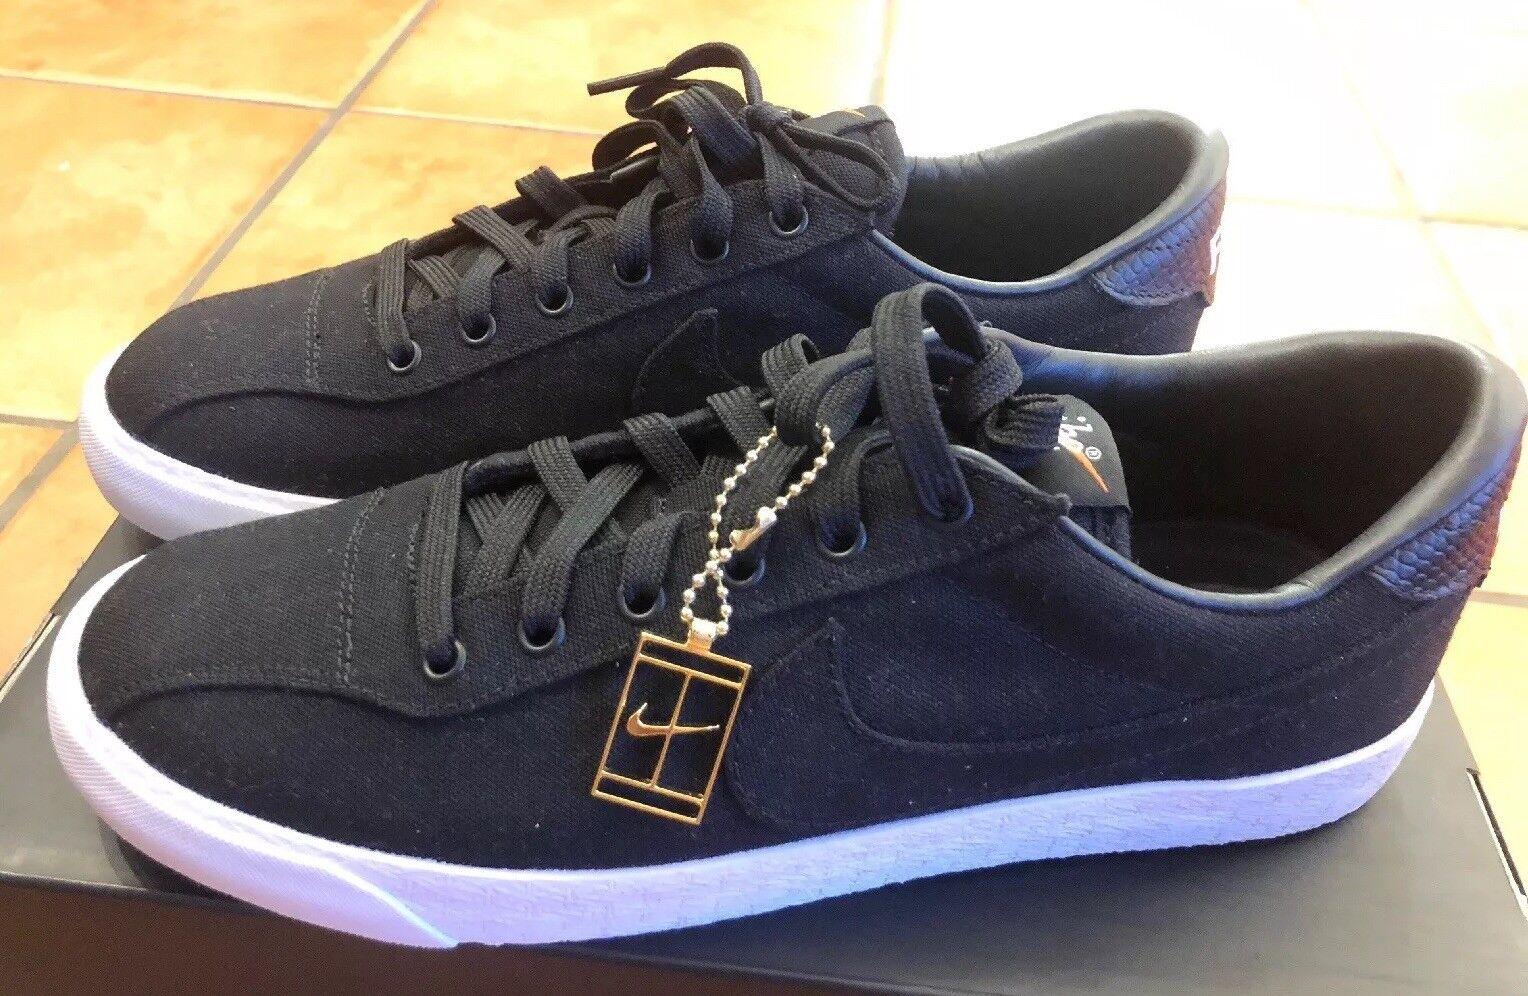 Nike Air Zoom Lauderdale Fragment Mens Tennis shoes Black White 857948 001 Sz 7